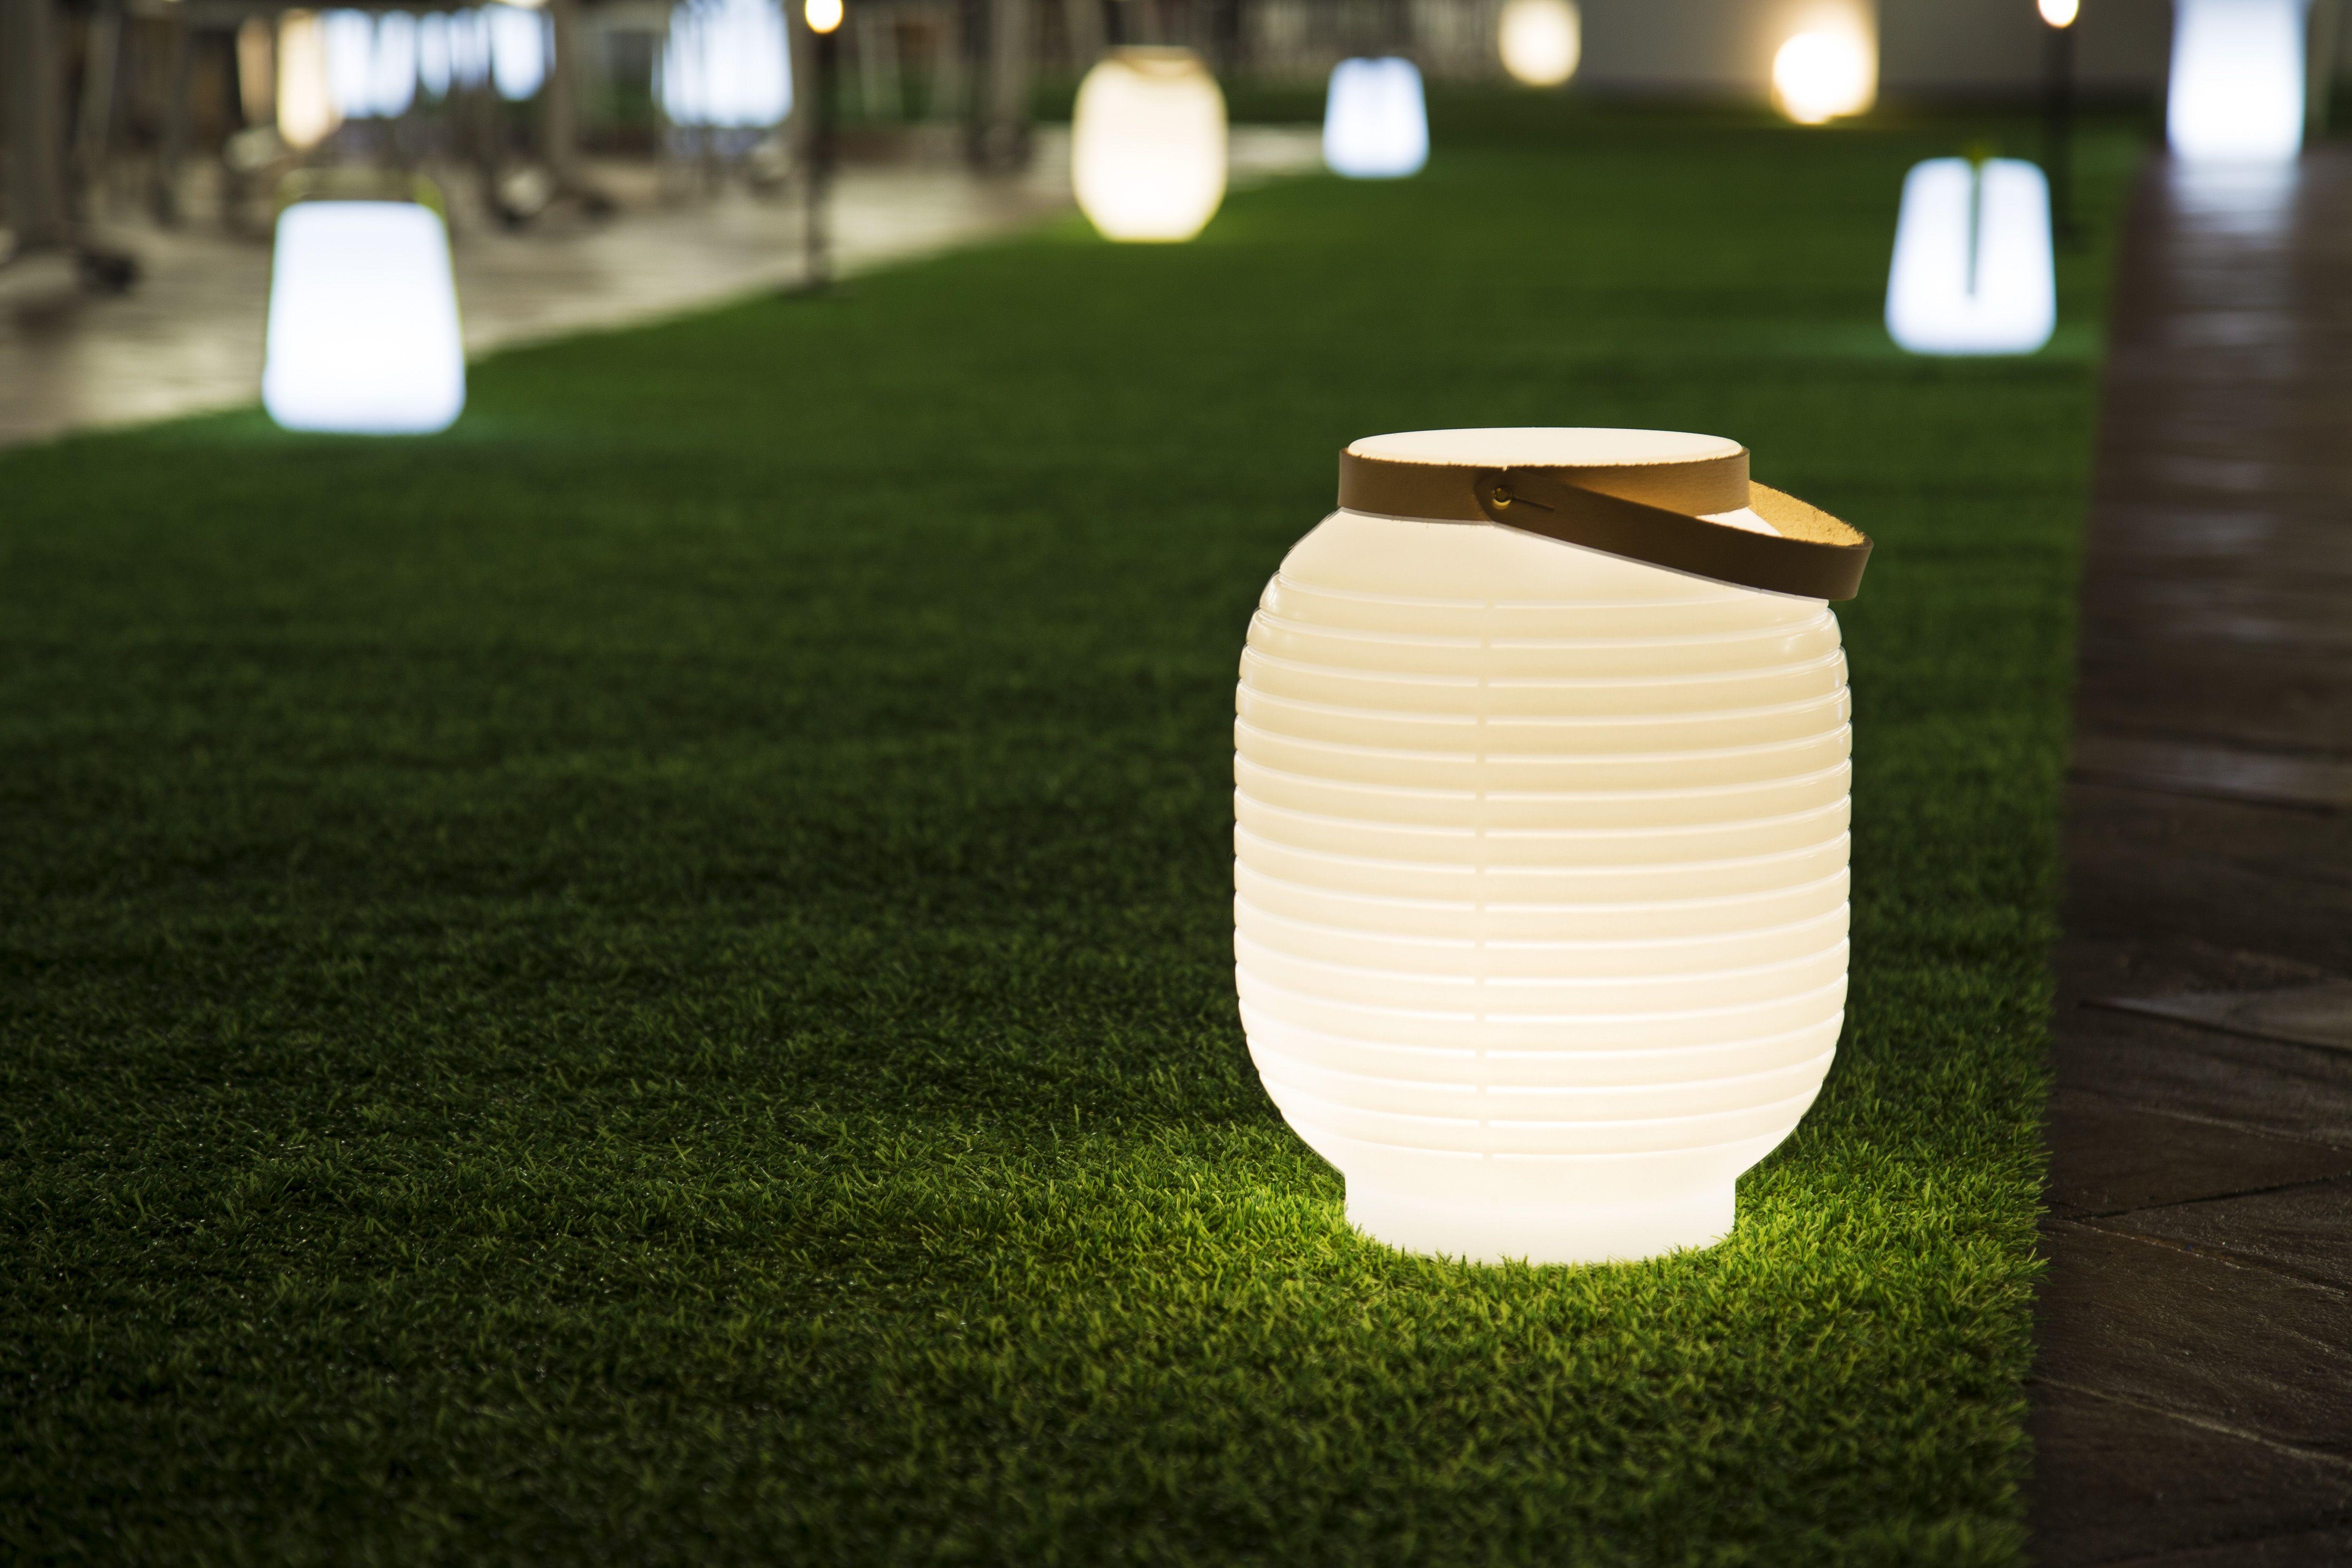 Honey lantern design Raffaella Mangiarotti for Serralunga 2015 photo Ludovica Mangini courtesy & Honey lantern design Raffaella Mangiarotti for Serralunga 2015 ...